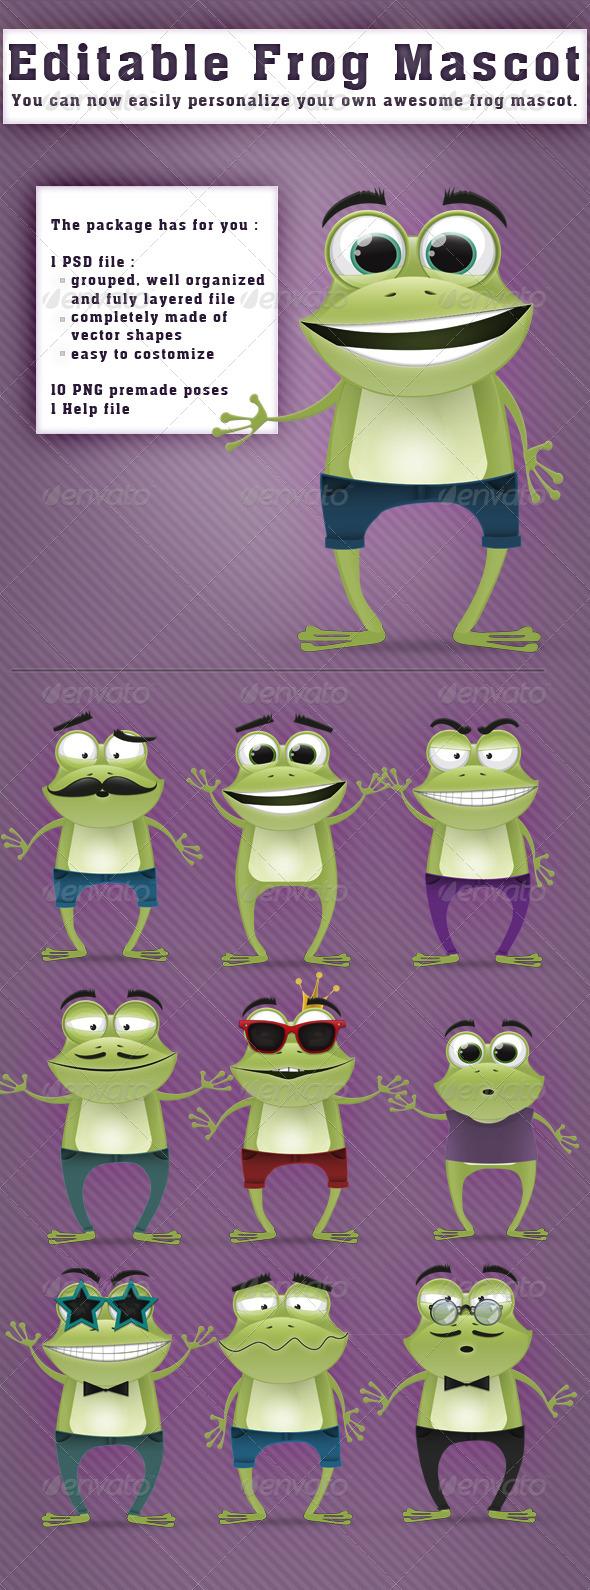 GraphicRiver Editable Frog Mascot 4064746